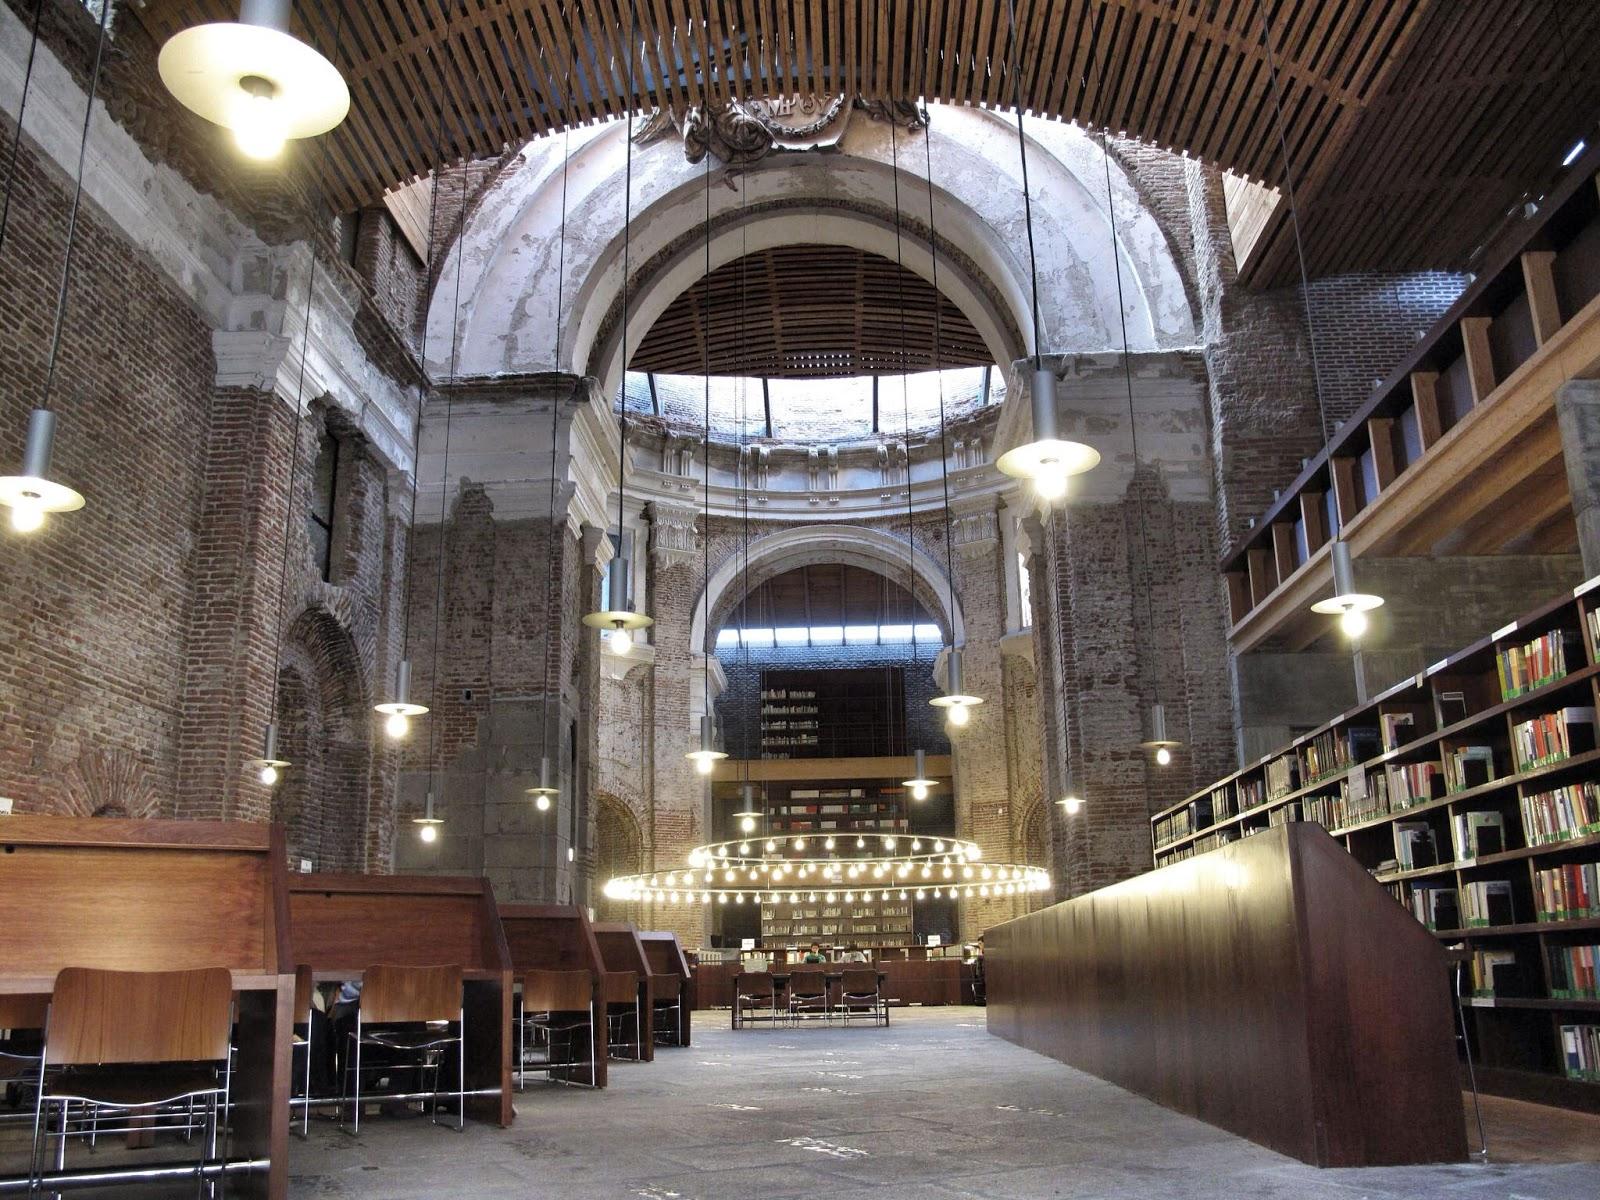 Arqueolog a de la arquitectura reharq libe fern ndez for Arquitectura de interiores madrid